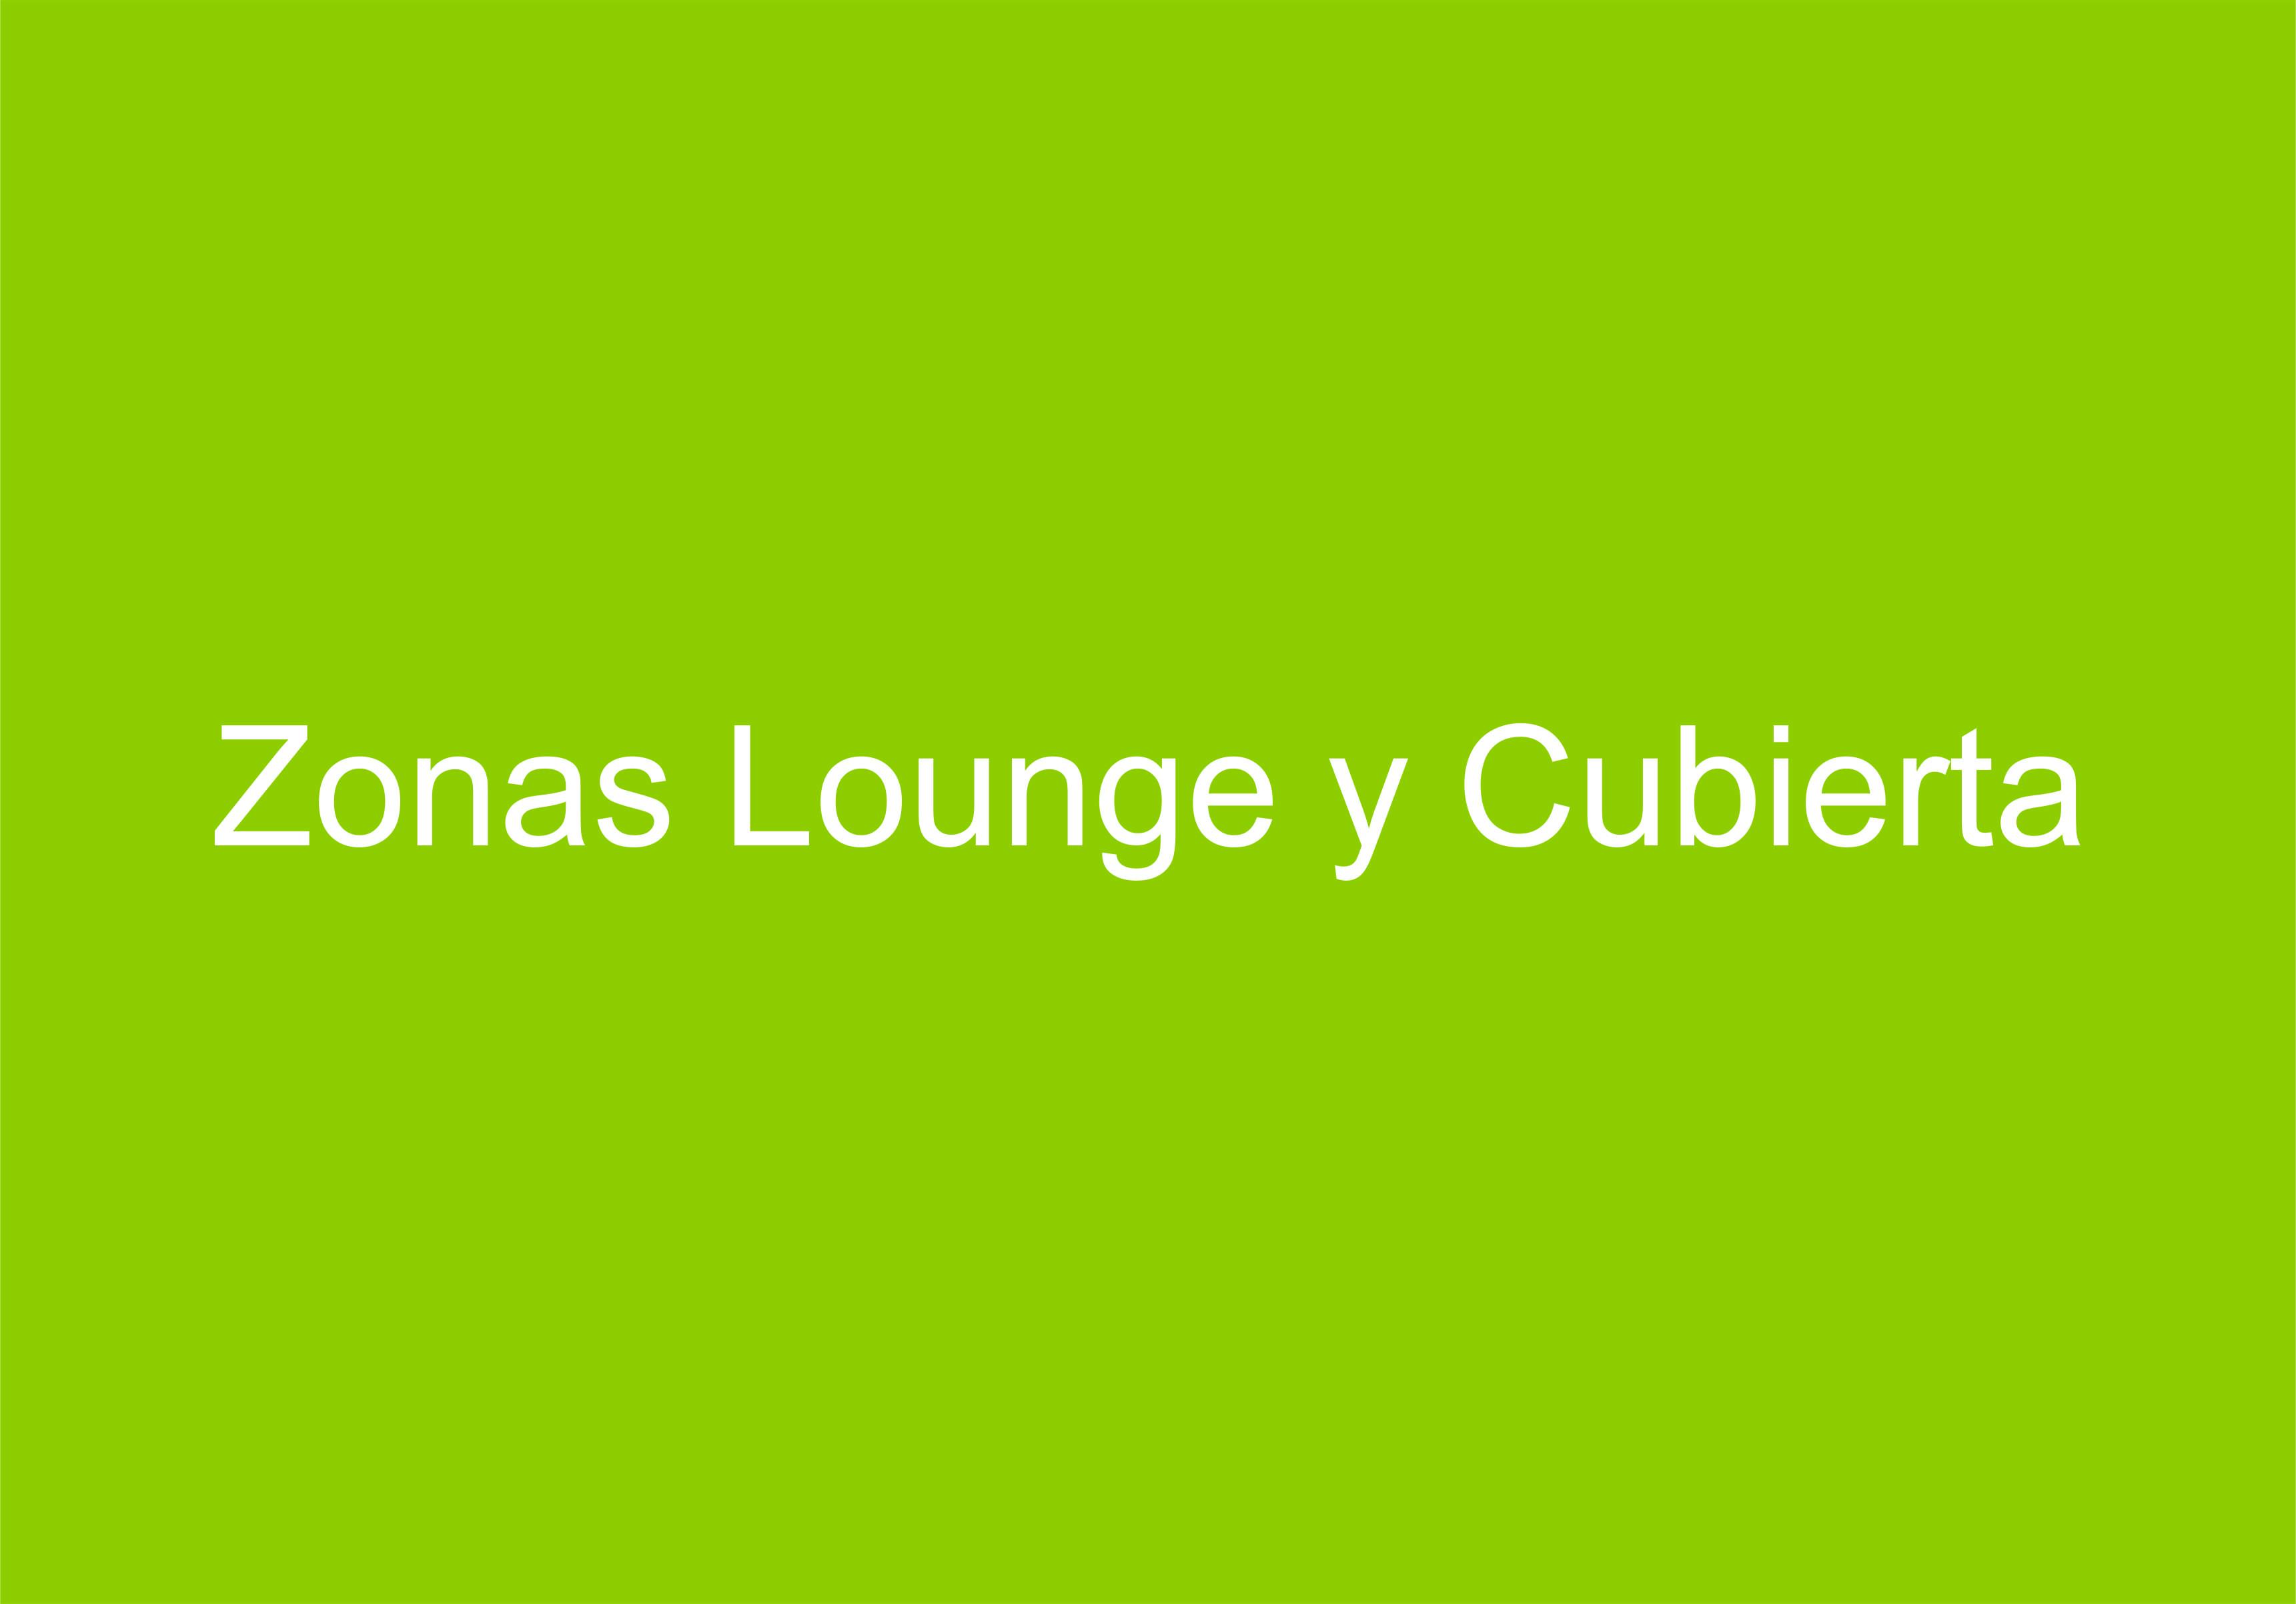 zonas lounge y cubierta.jpg